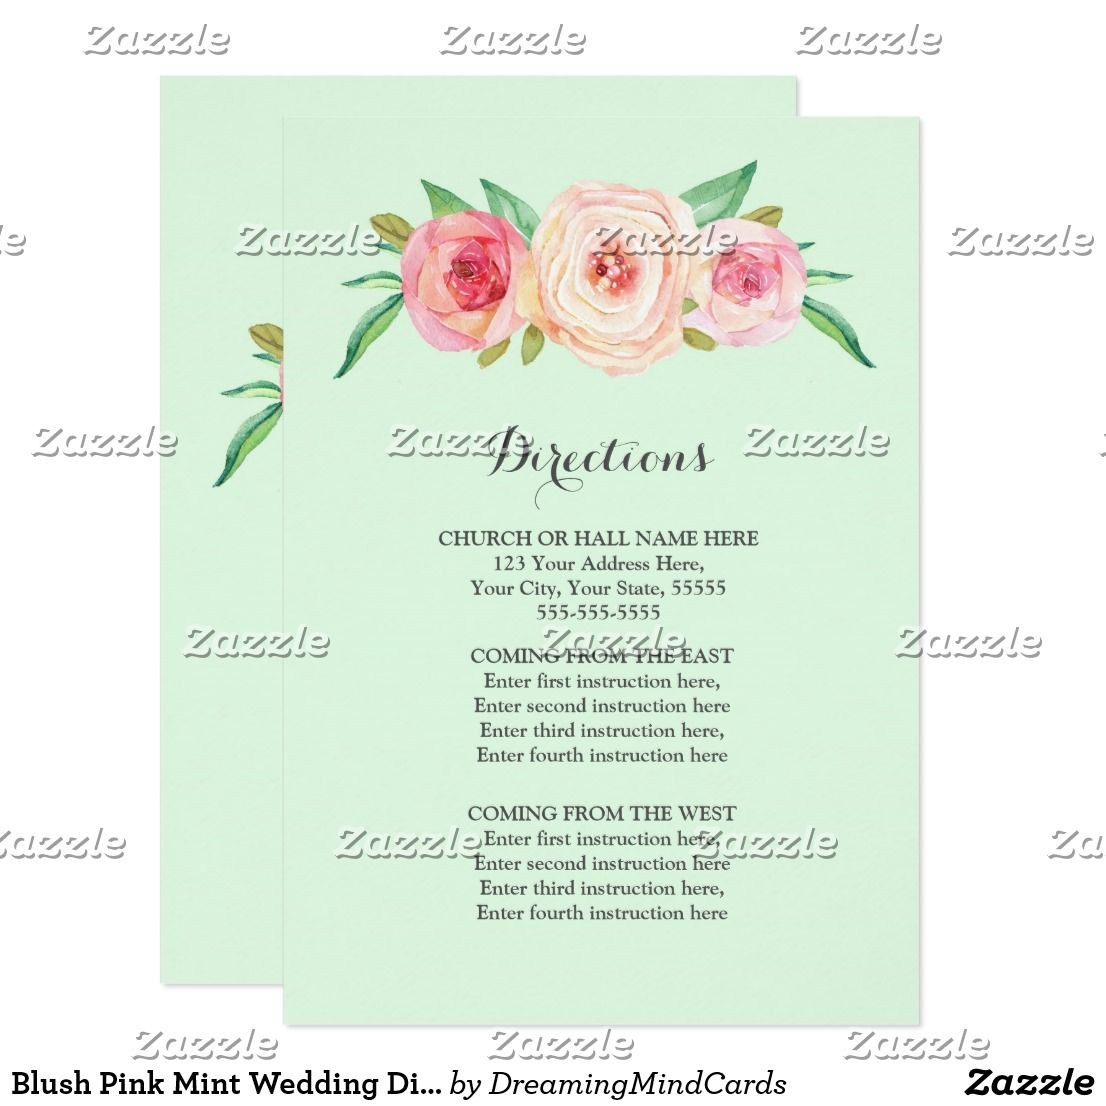 Blush pink mint wedding direction insert